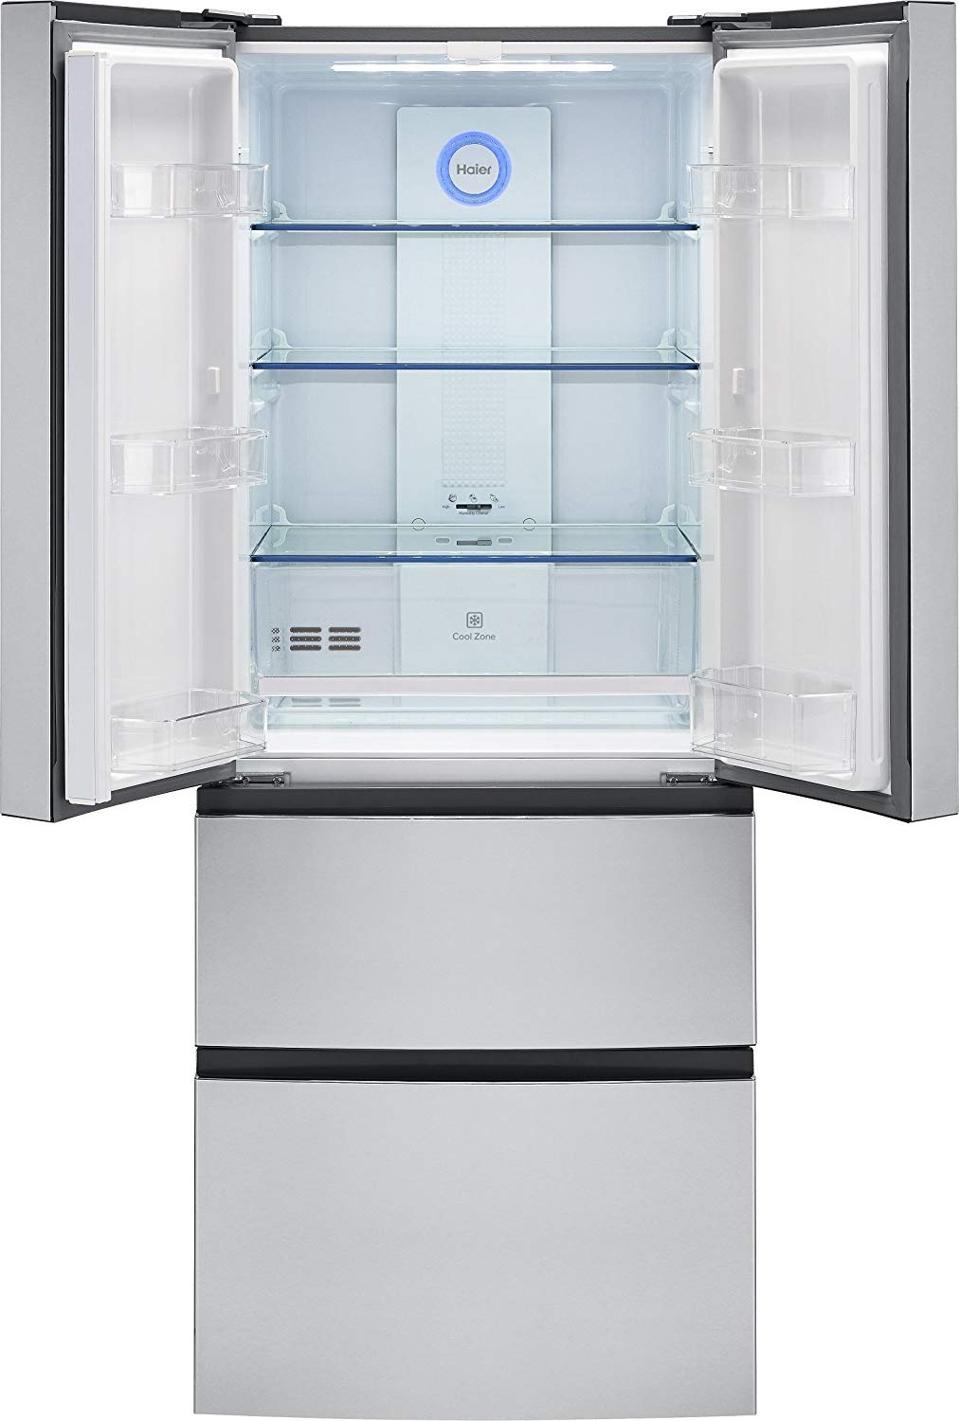 Haier 15-Cu.-Ft. French-Door Refrigerator